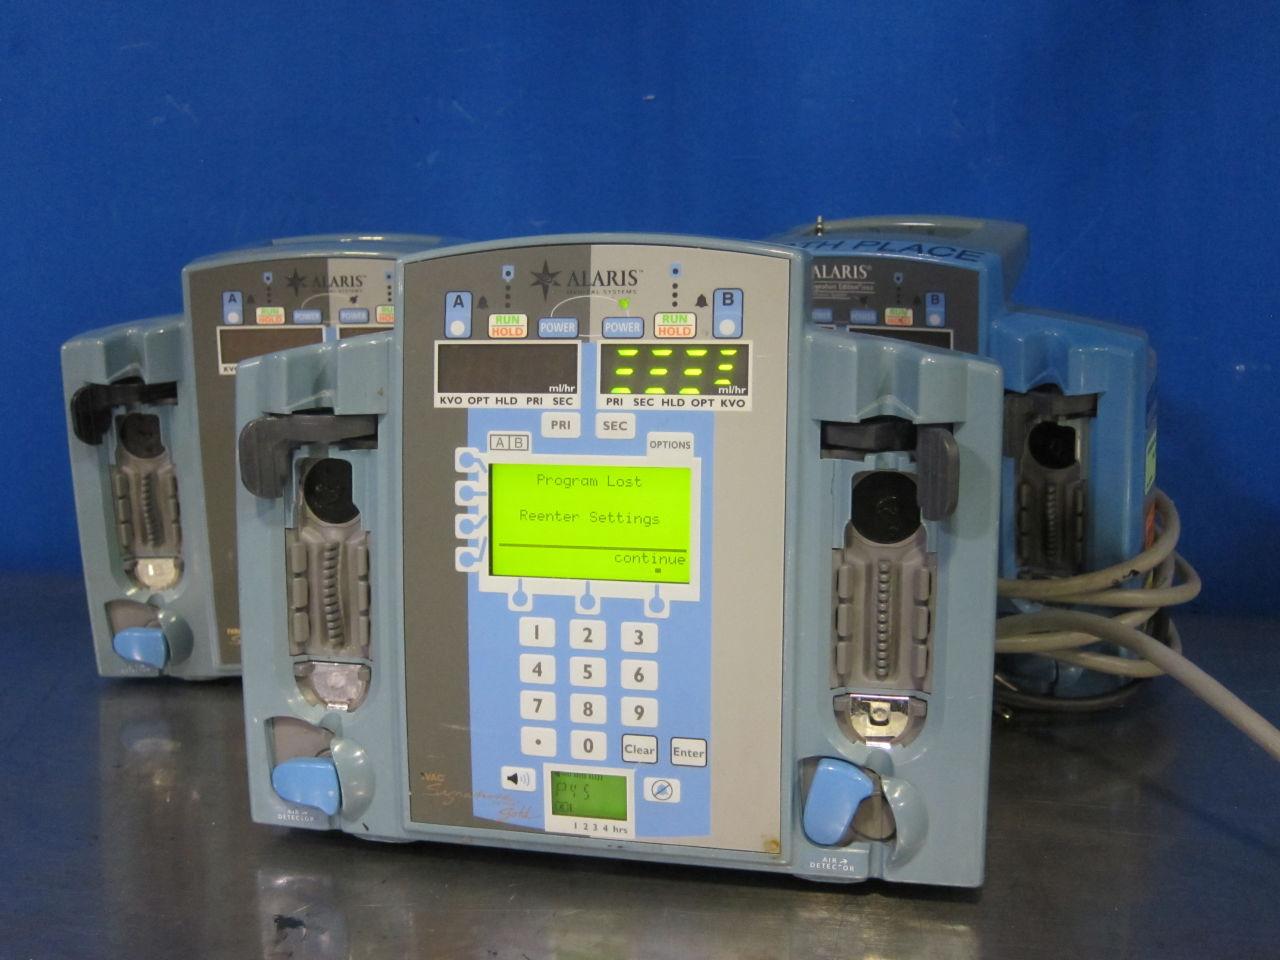 ALARIS 7230  - Lot of 3 Pump IV Infusion